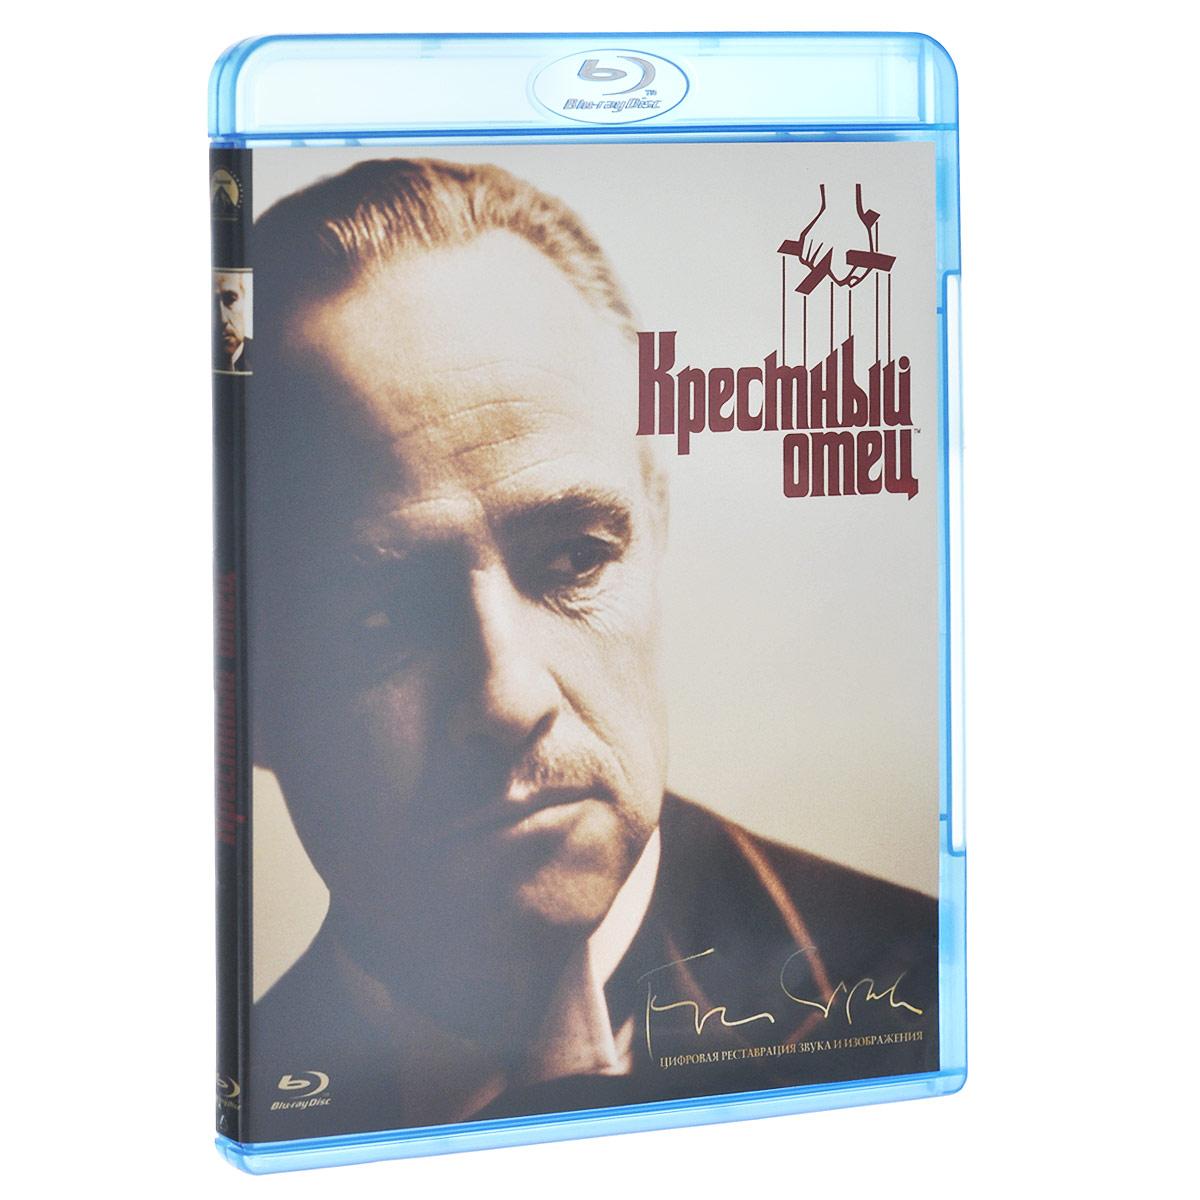 Крестный отец (Blu-ray)  видеодиски нд плэй сборник фильмов крестный отец крестный отец 2 крестный отец 3